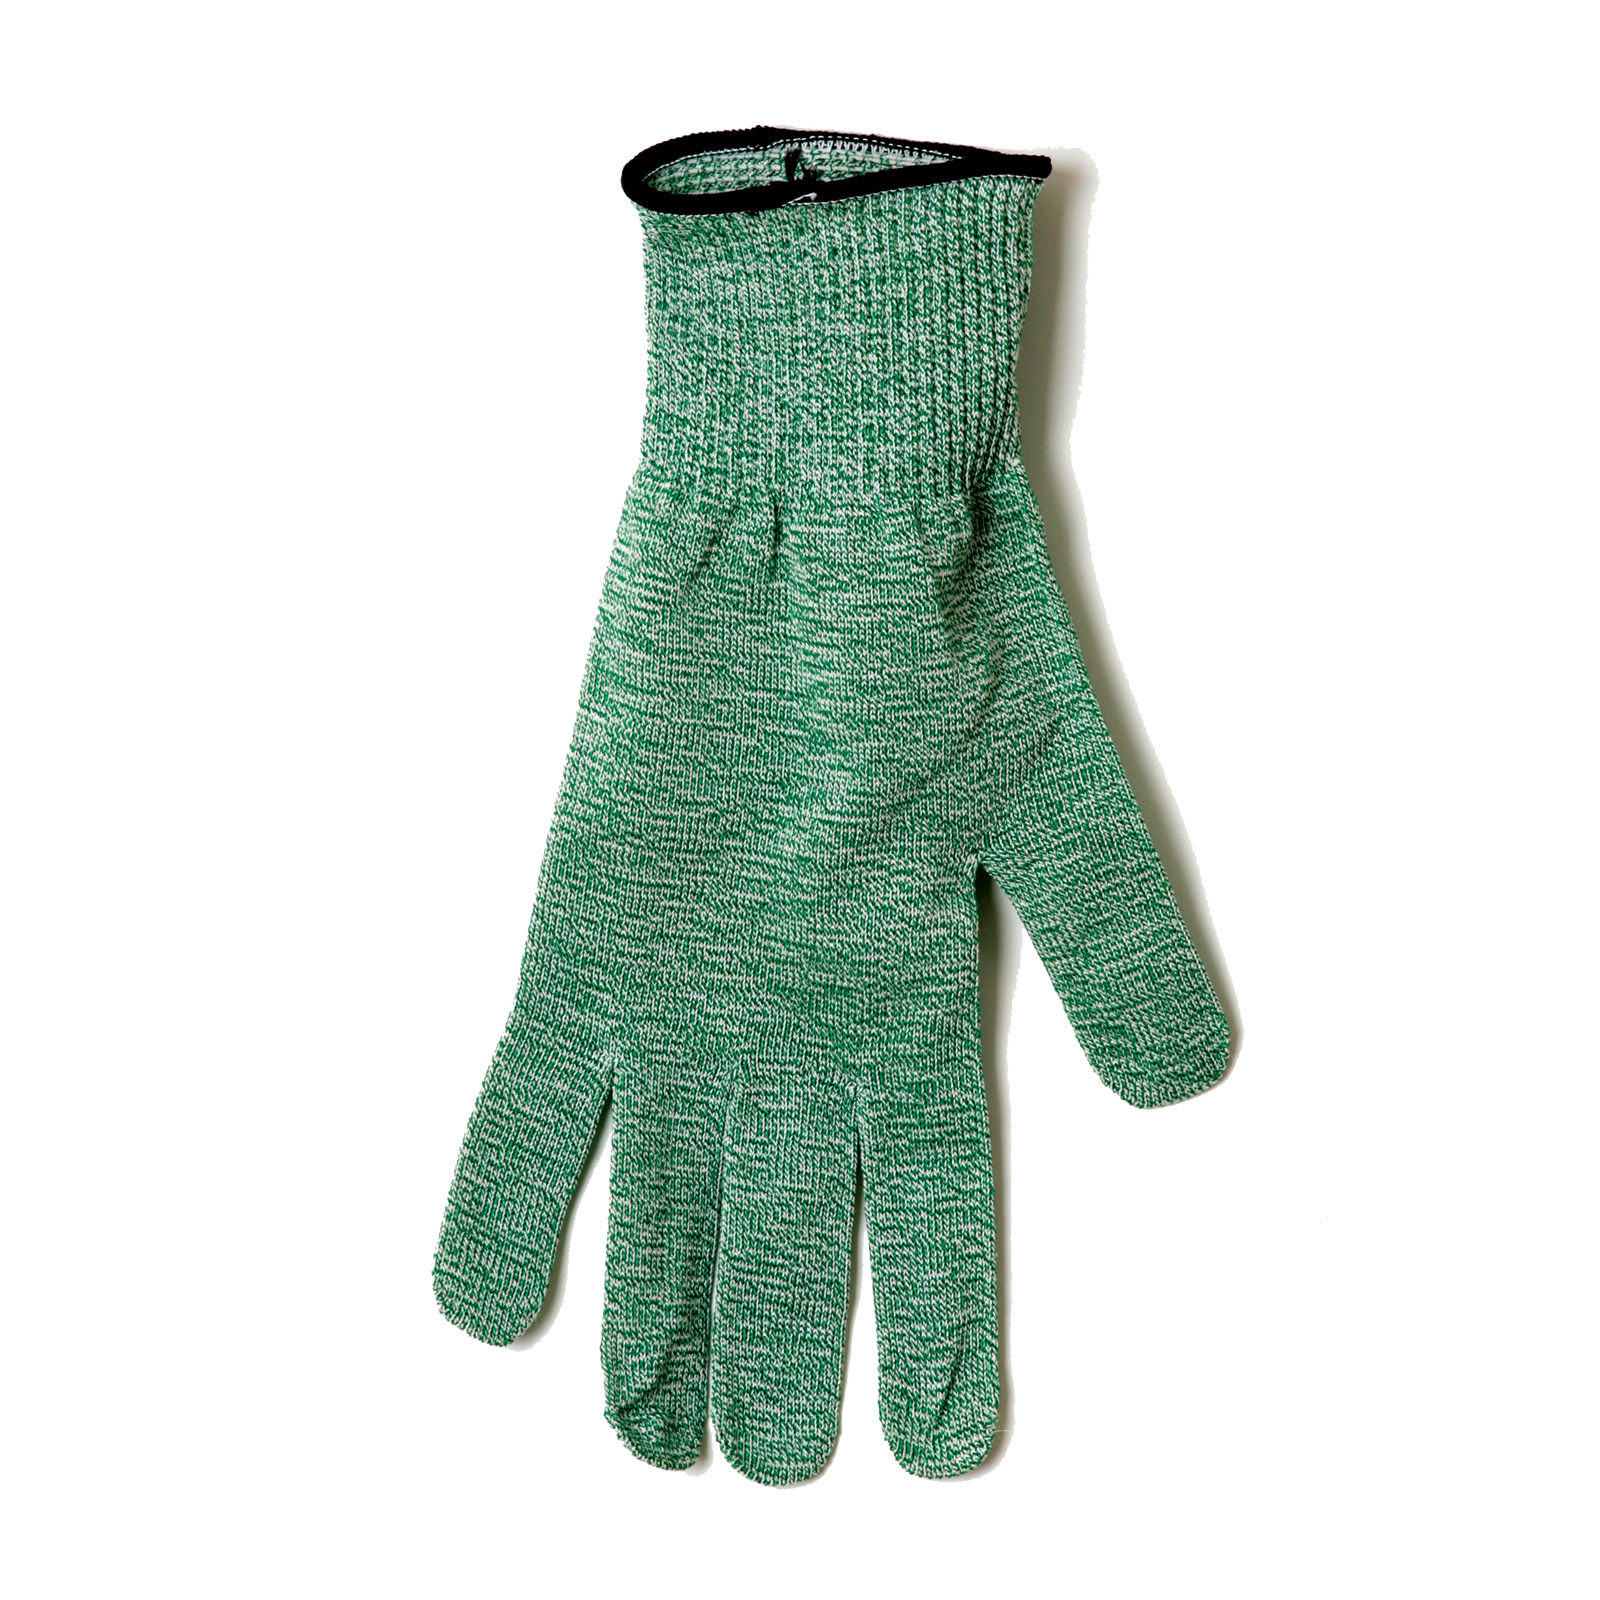 San Jamar SG10-GN-M glove, cut resistant